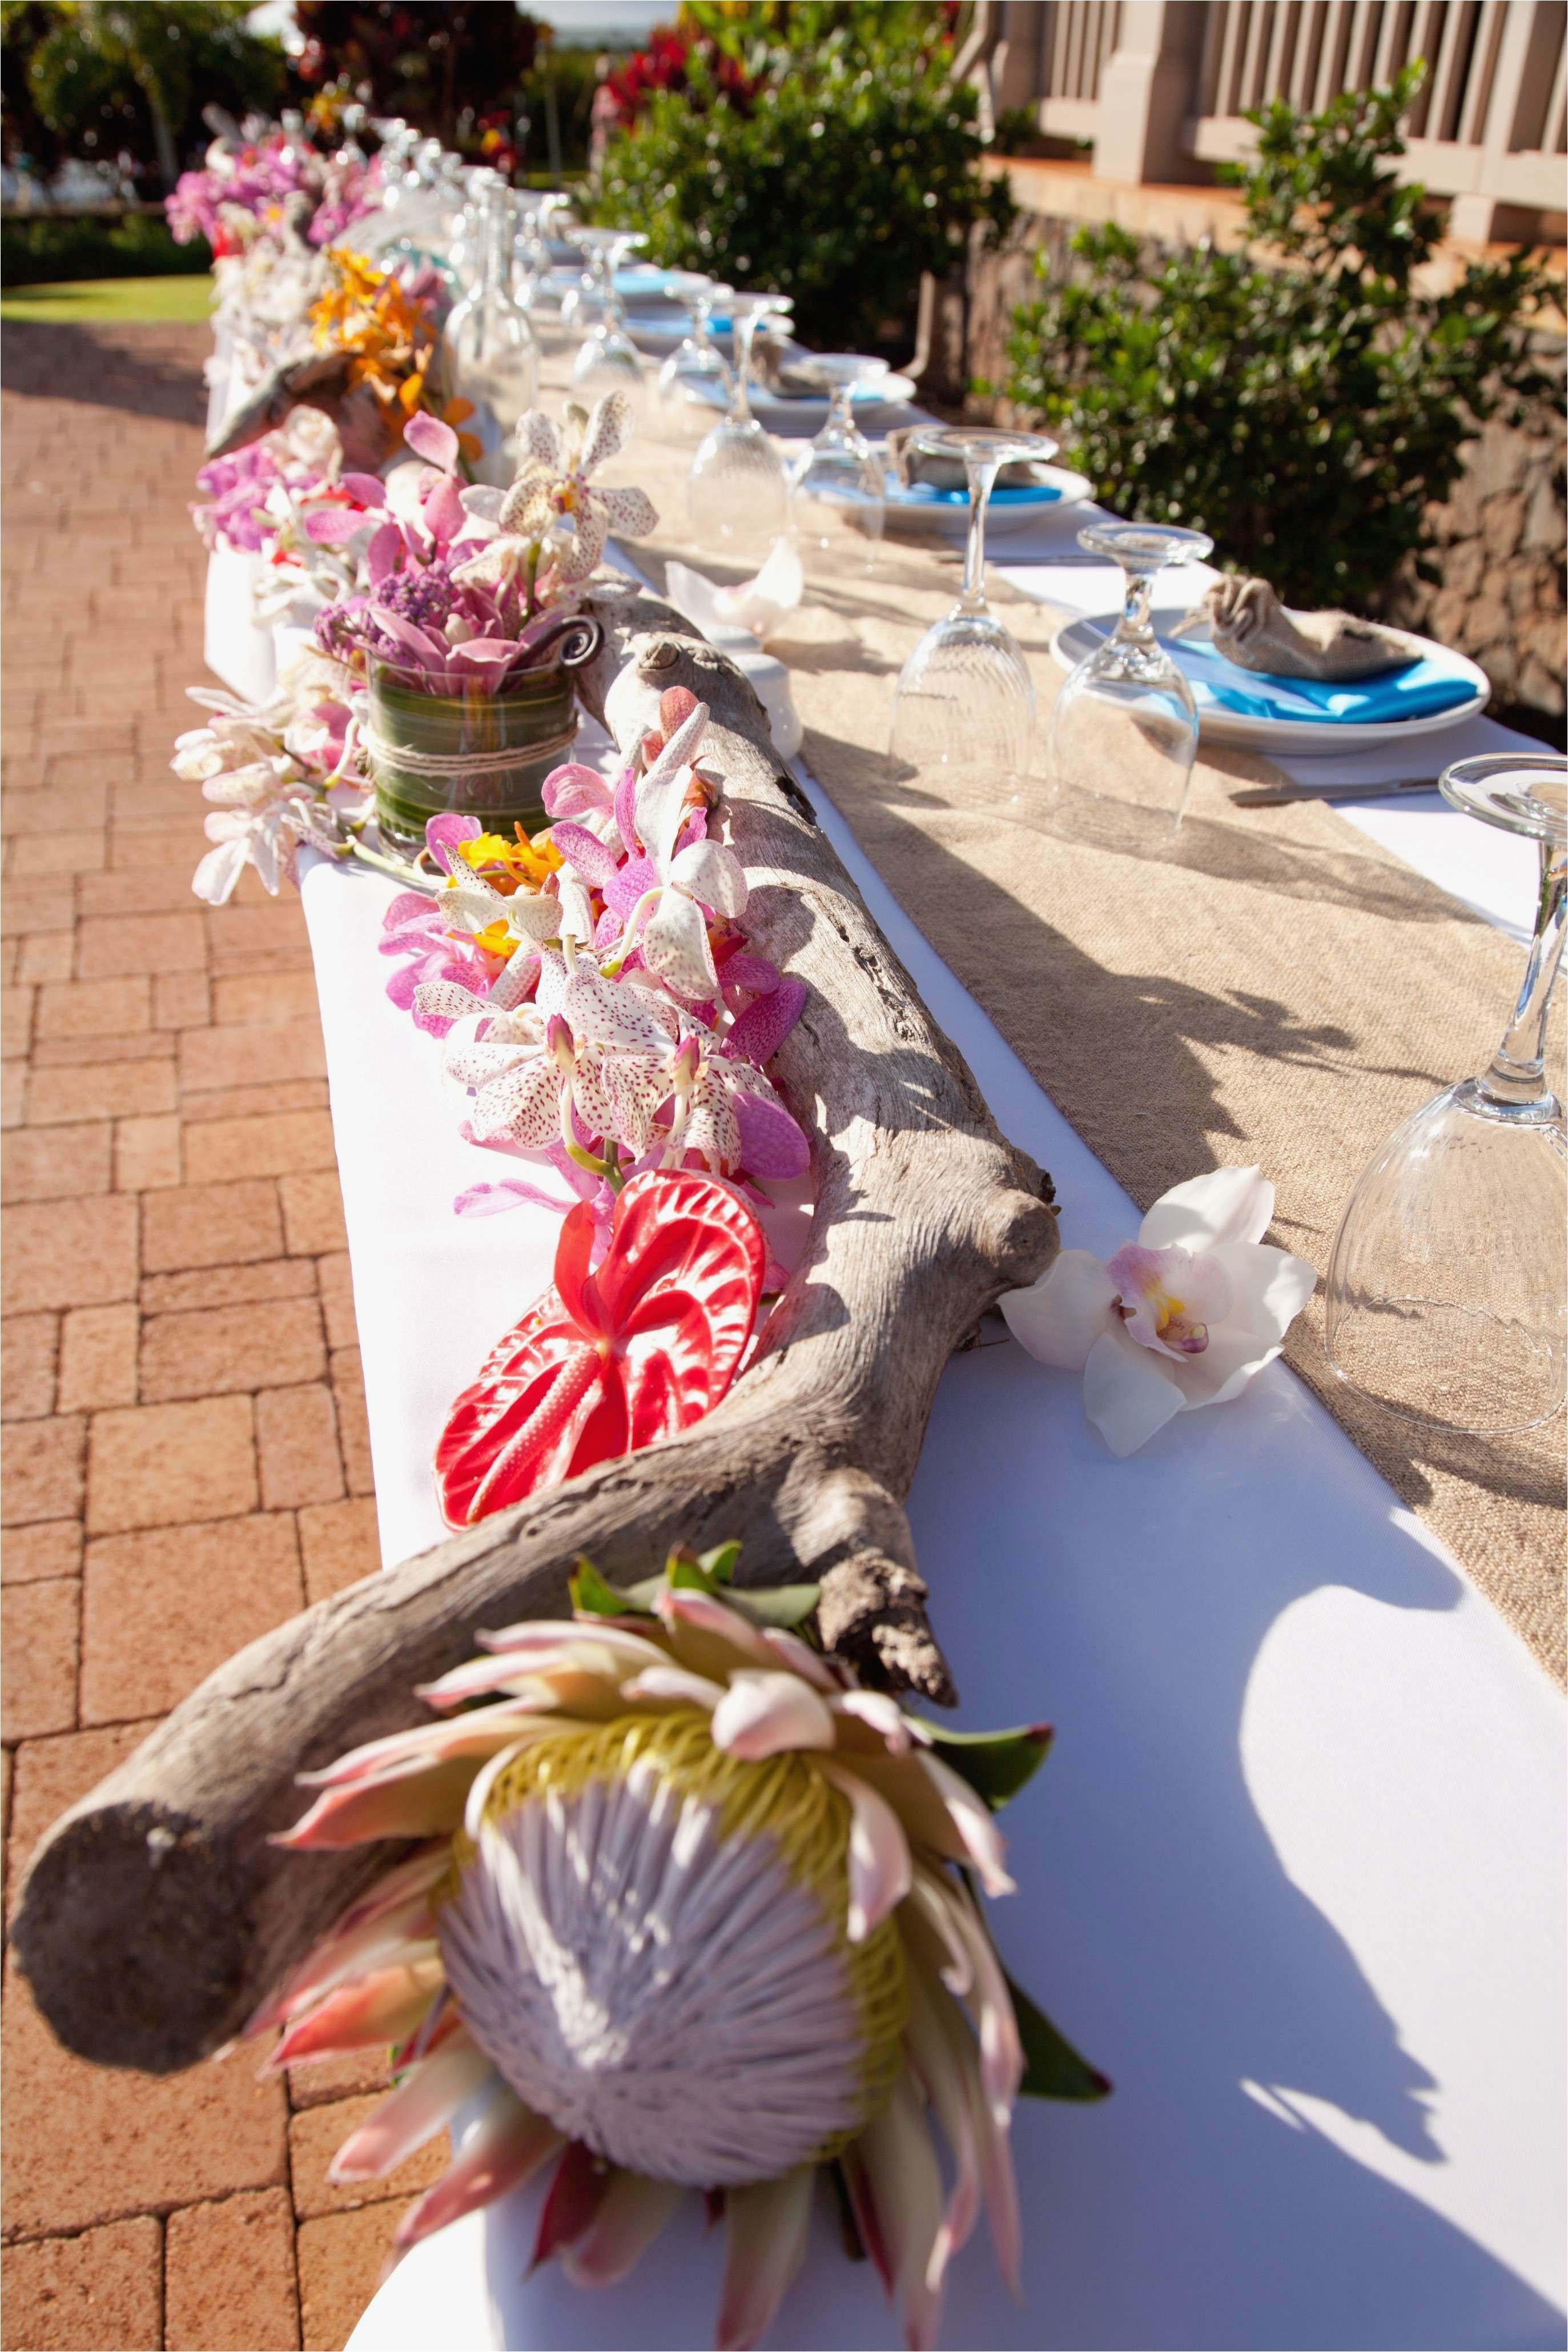 walmart glass flower vases of decorations for weddings for your plan wedding diy wedding regarding decorations for weddings model table decorations for wedding decorating ideas with charming photos